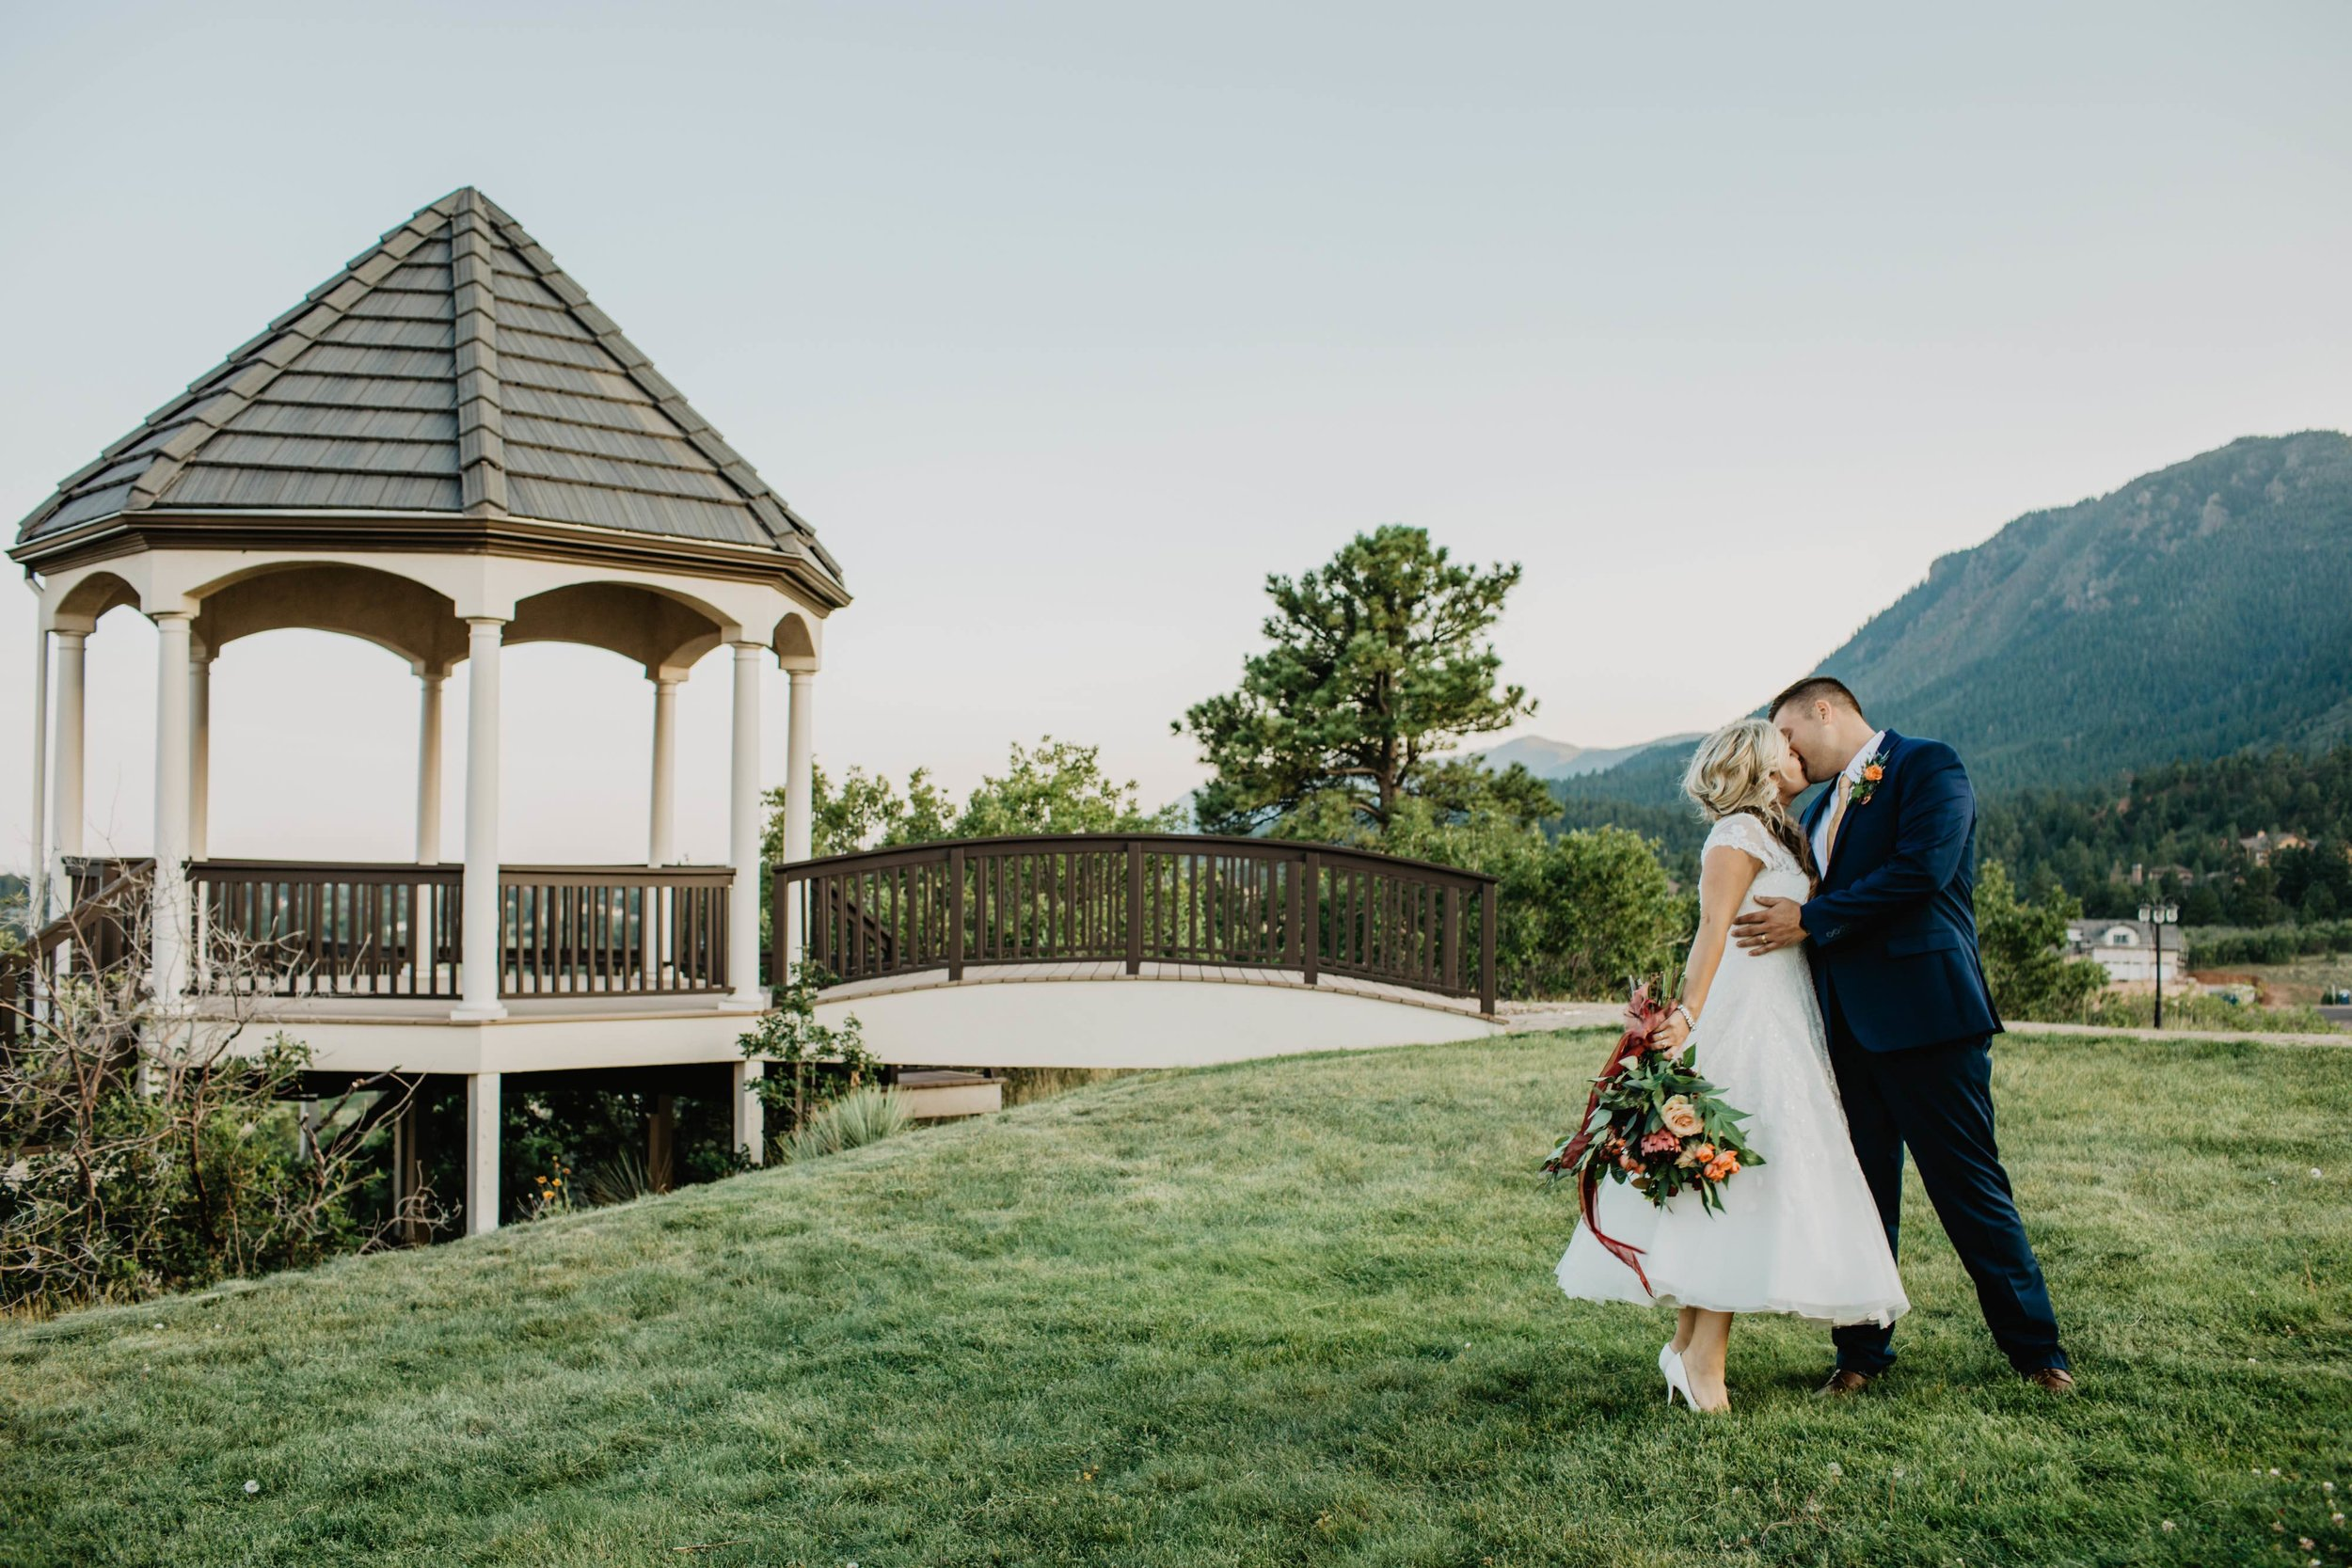 Kisa Conrad Favorites-0033-colorado-wedding-photographer-denver-springs-vail.jpeg